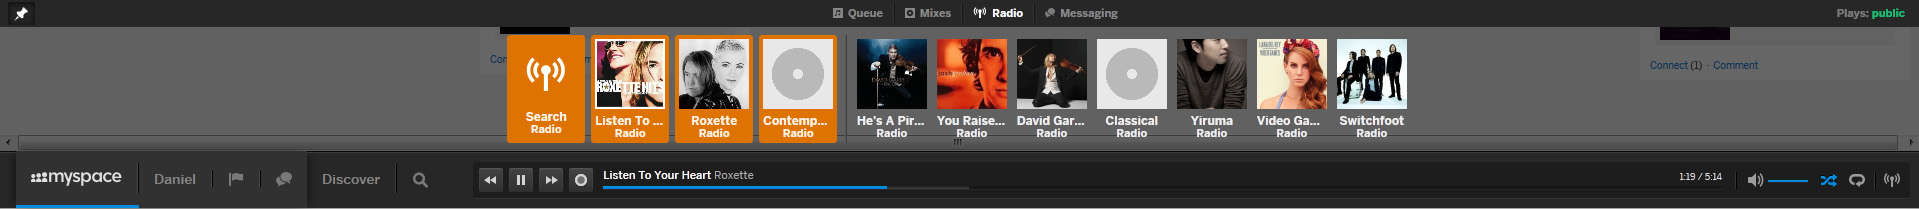 Myspace 05c (Bild: eigenes)